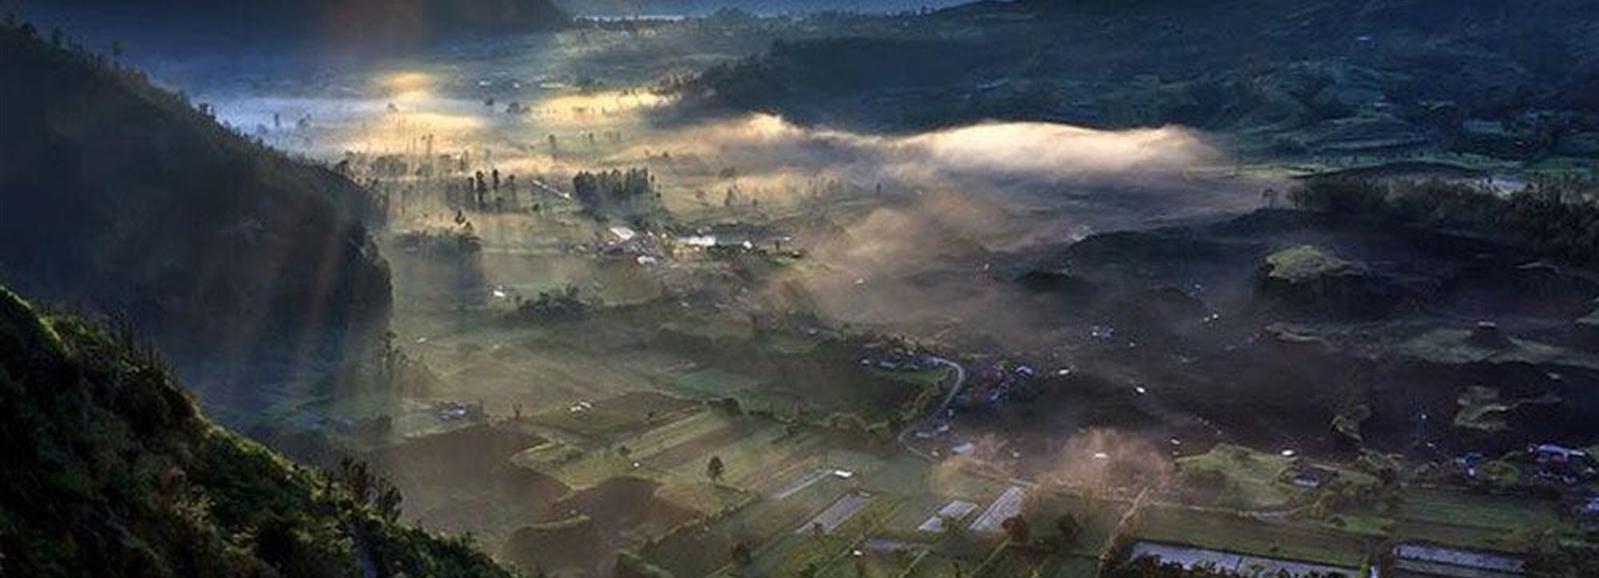 Bali: Best Sunrise Spots & Ubud Monkey Forest Private Tour